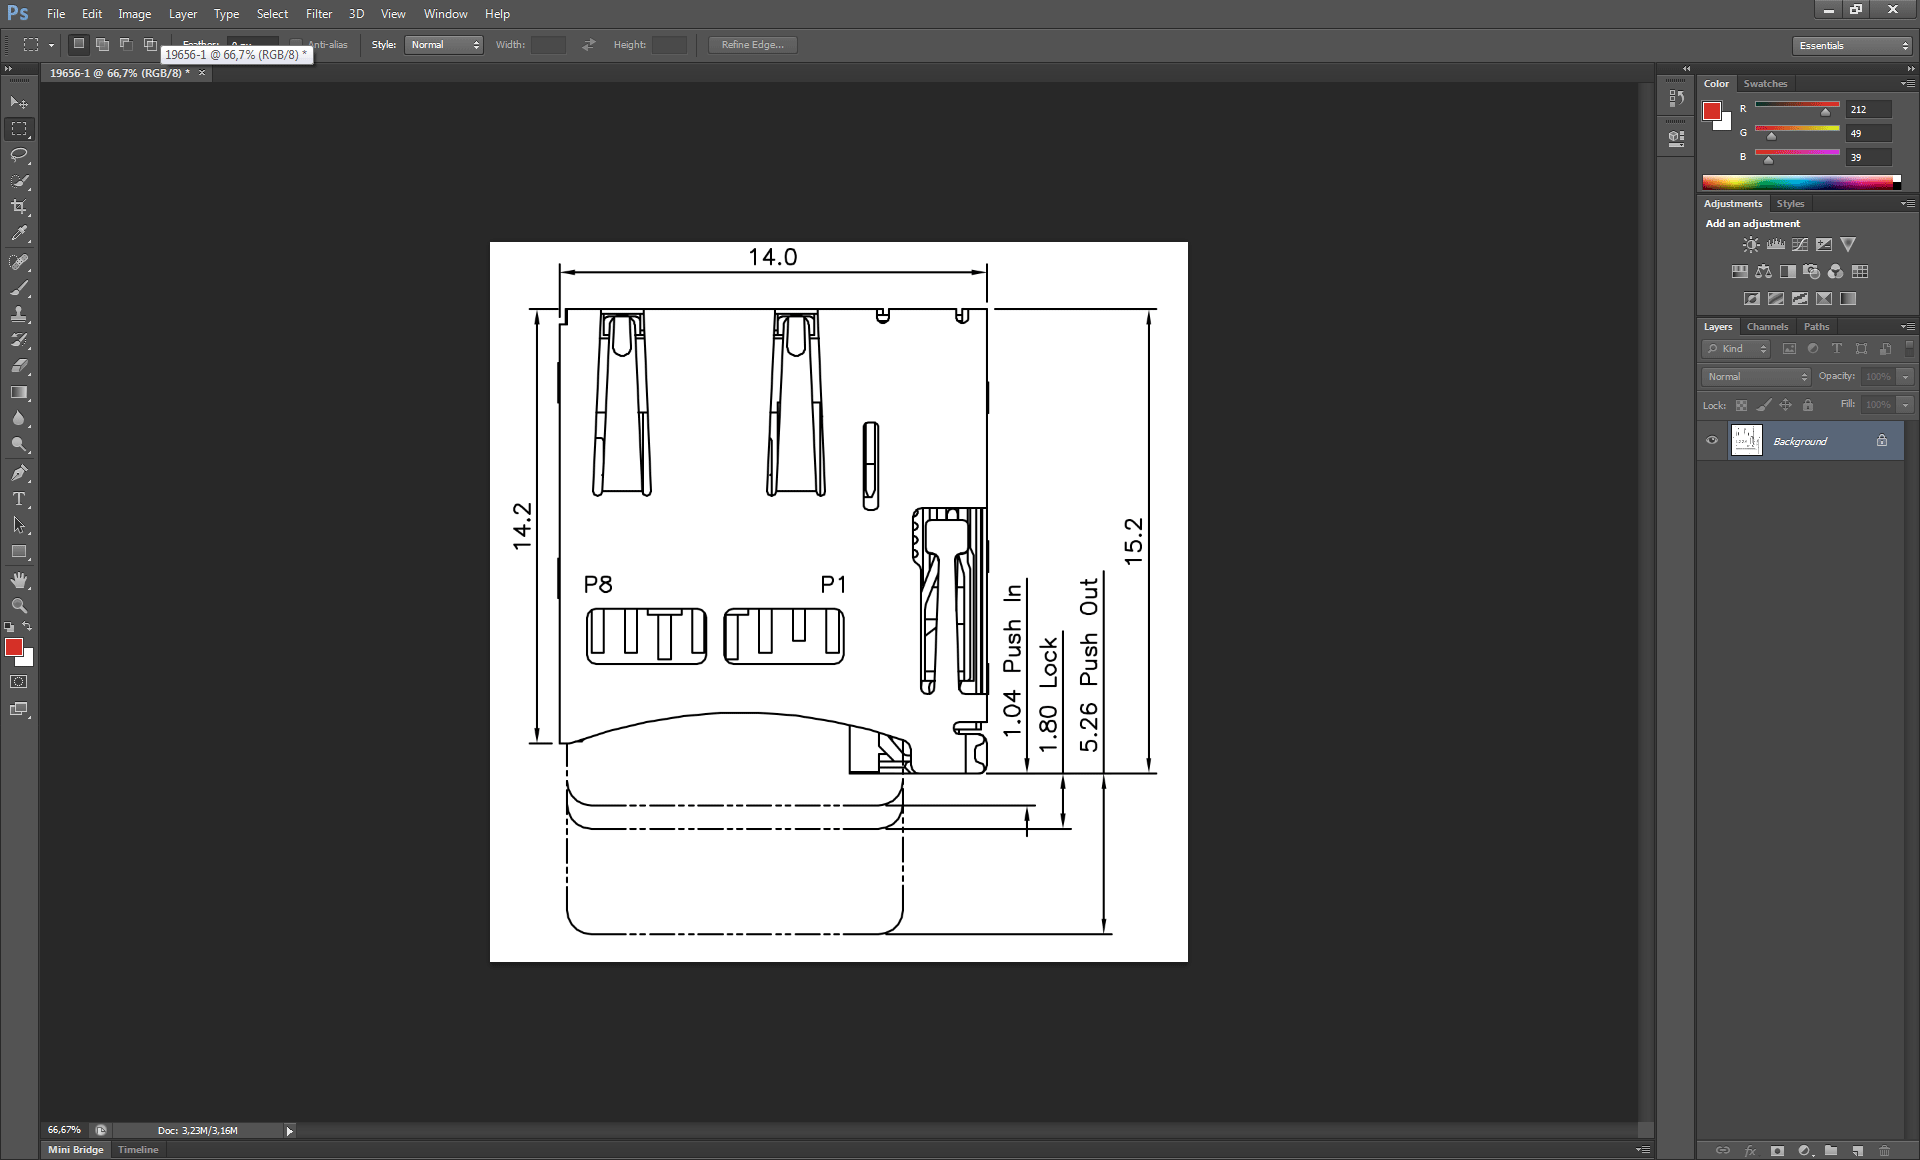 manufacturing_ImageEditor_Screenshot.png